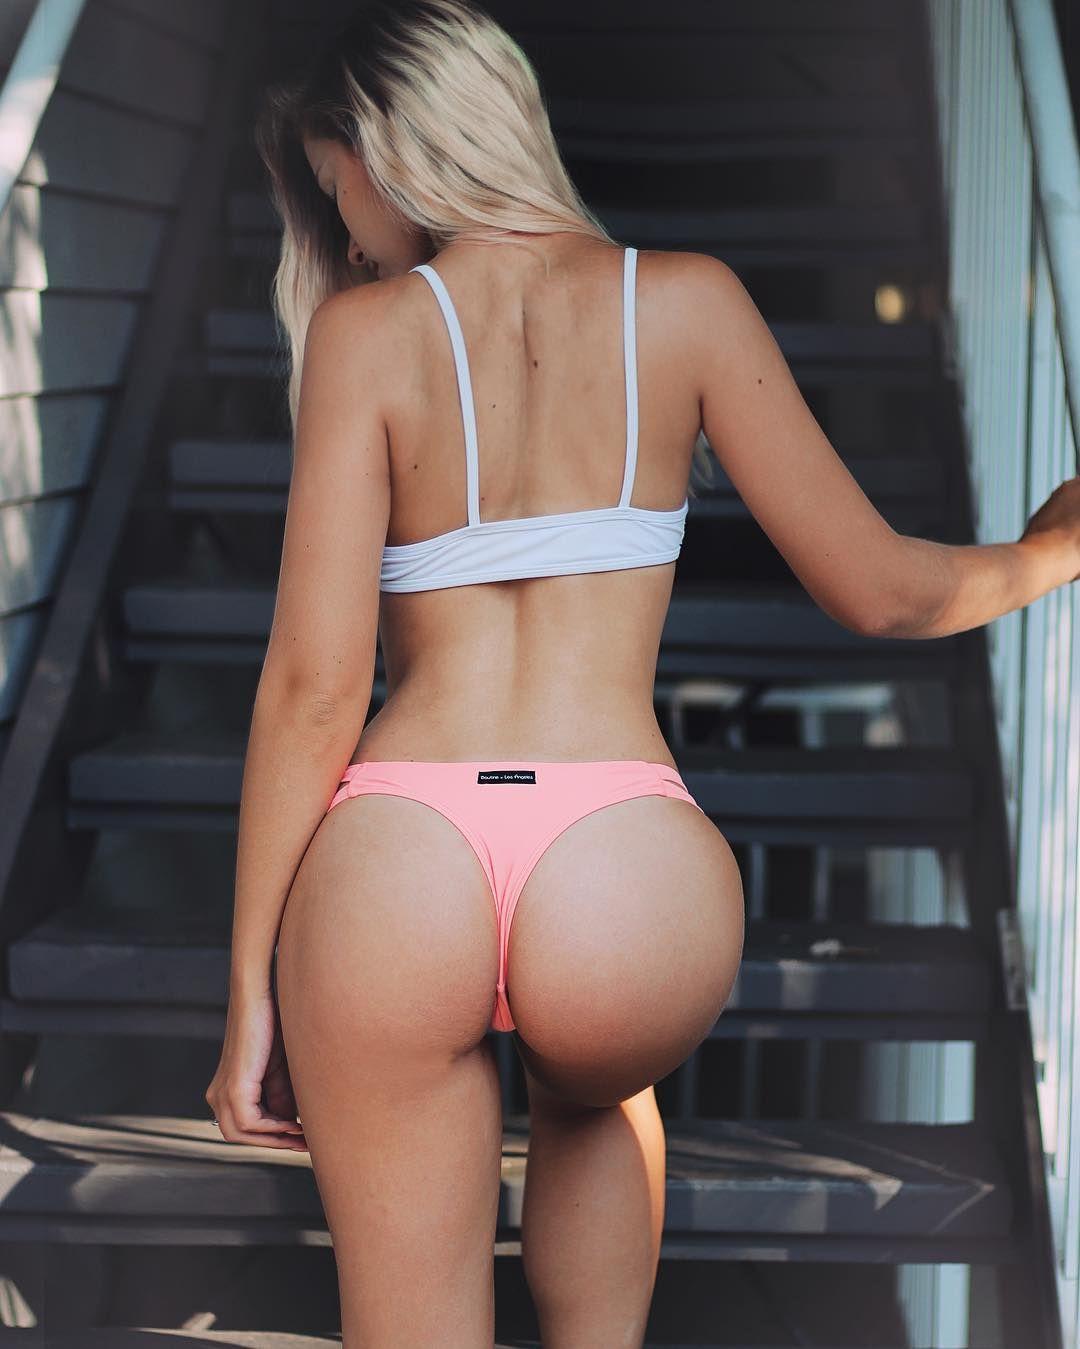 Hot Kayla Shea nudes (91 photo), Pussy, Paparazzi, Feet, cameltoe 2017